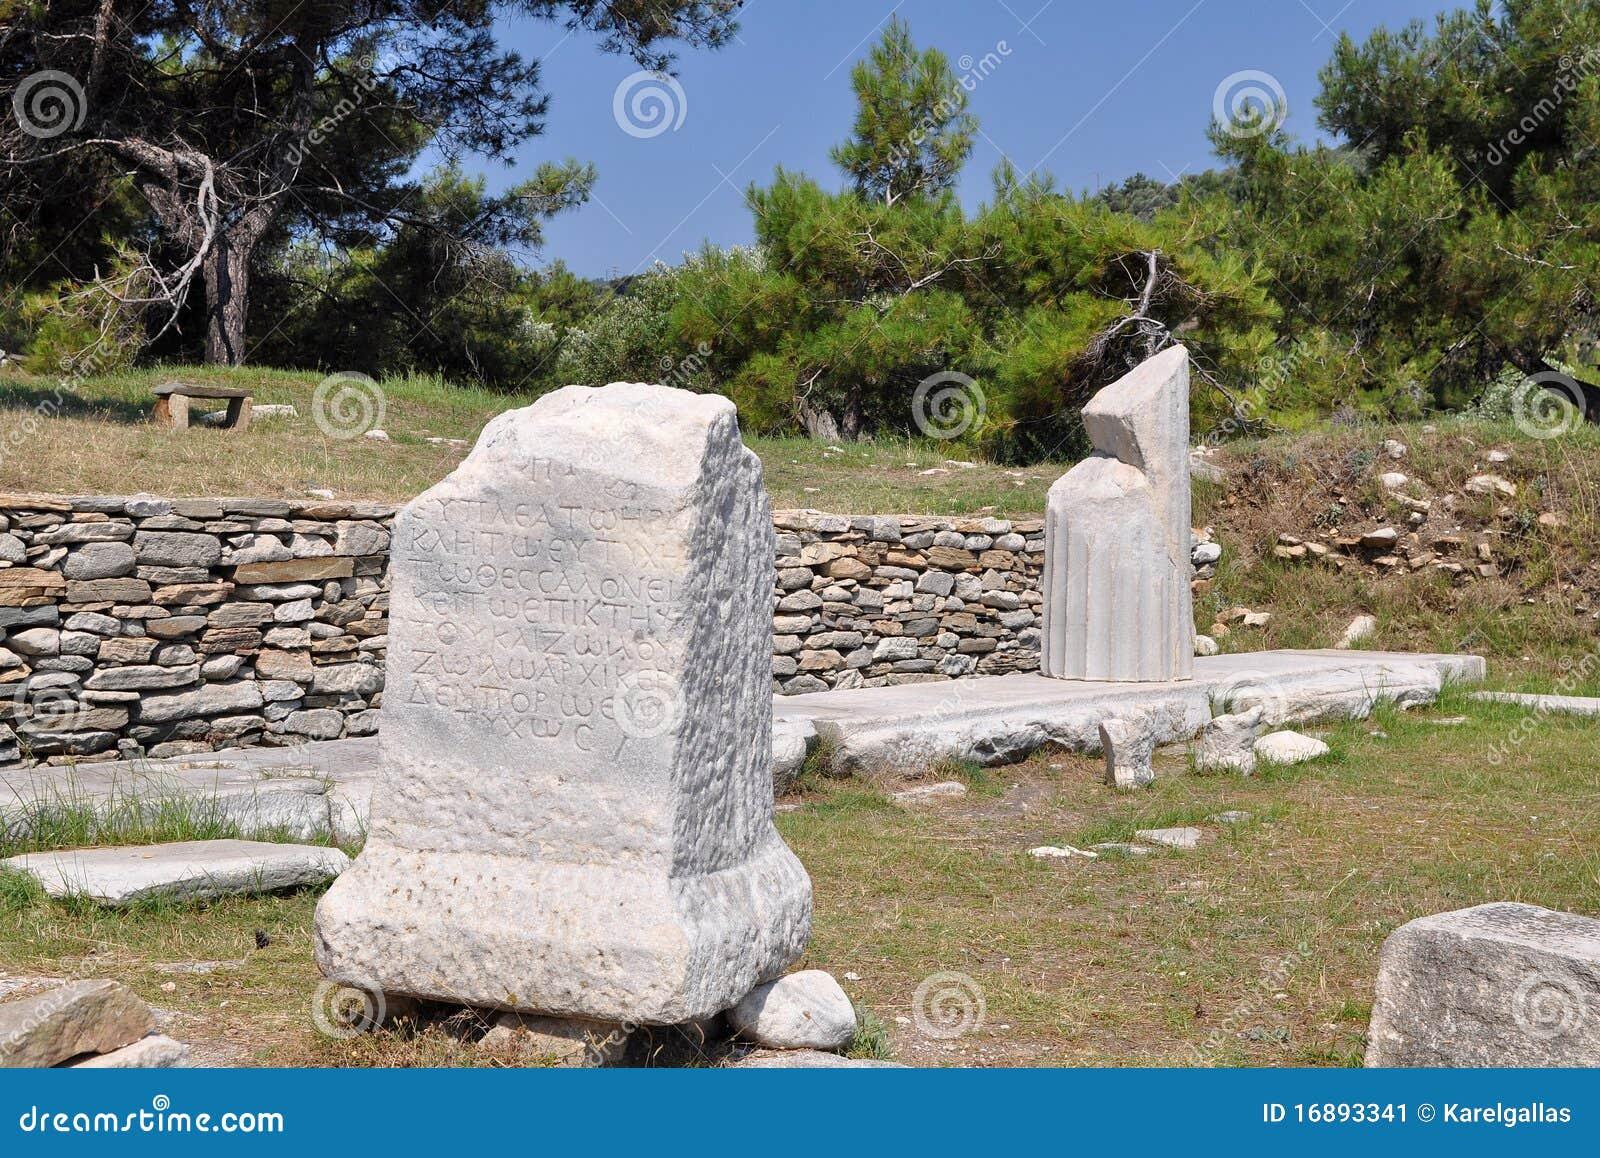 Excavation In Aliki, Thassos, Greece Stock Image - Image ...